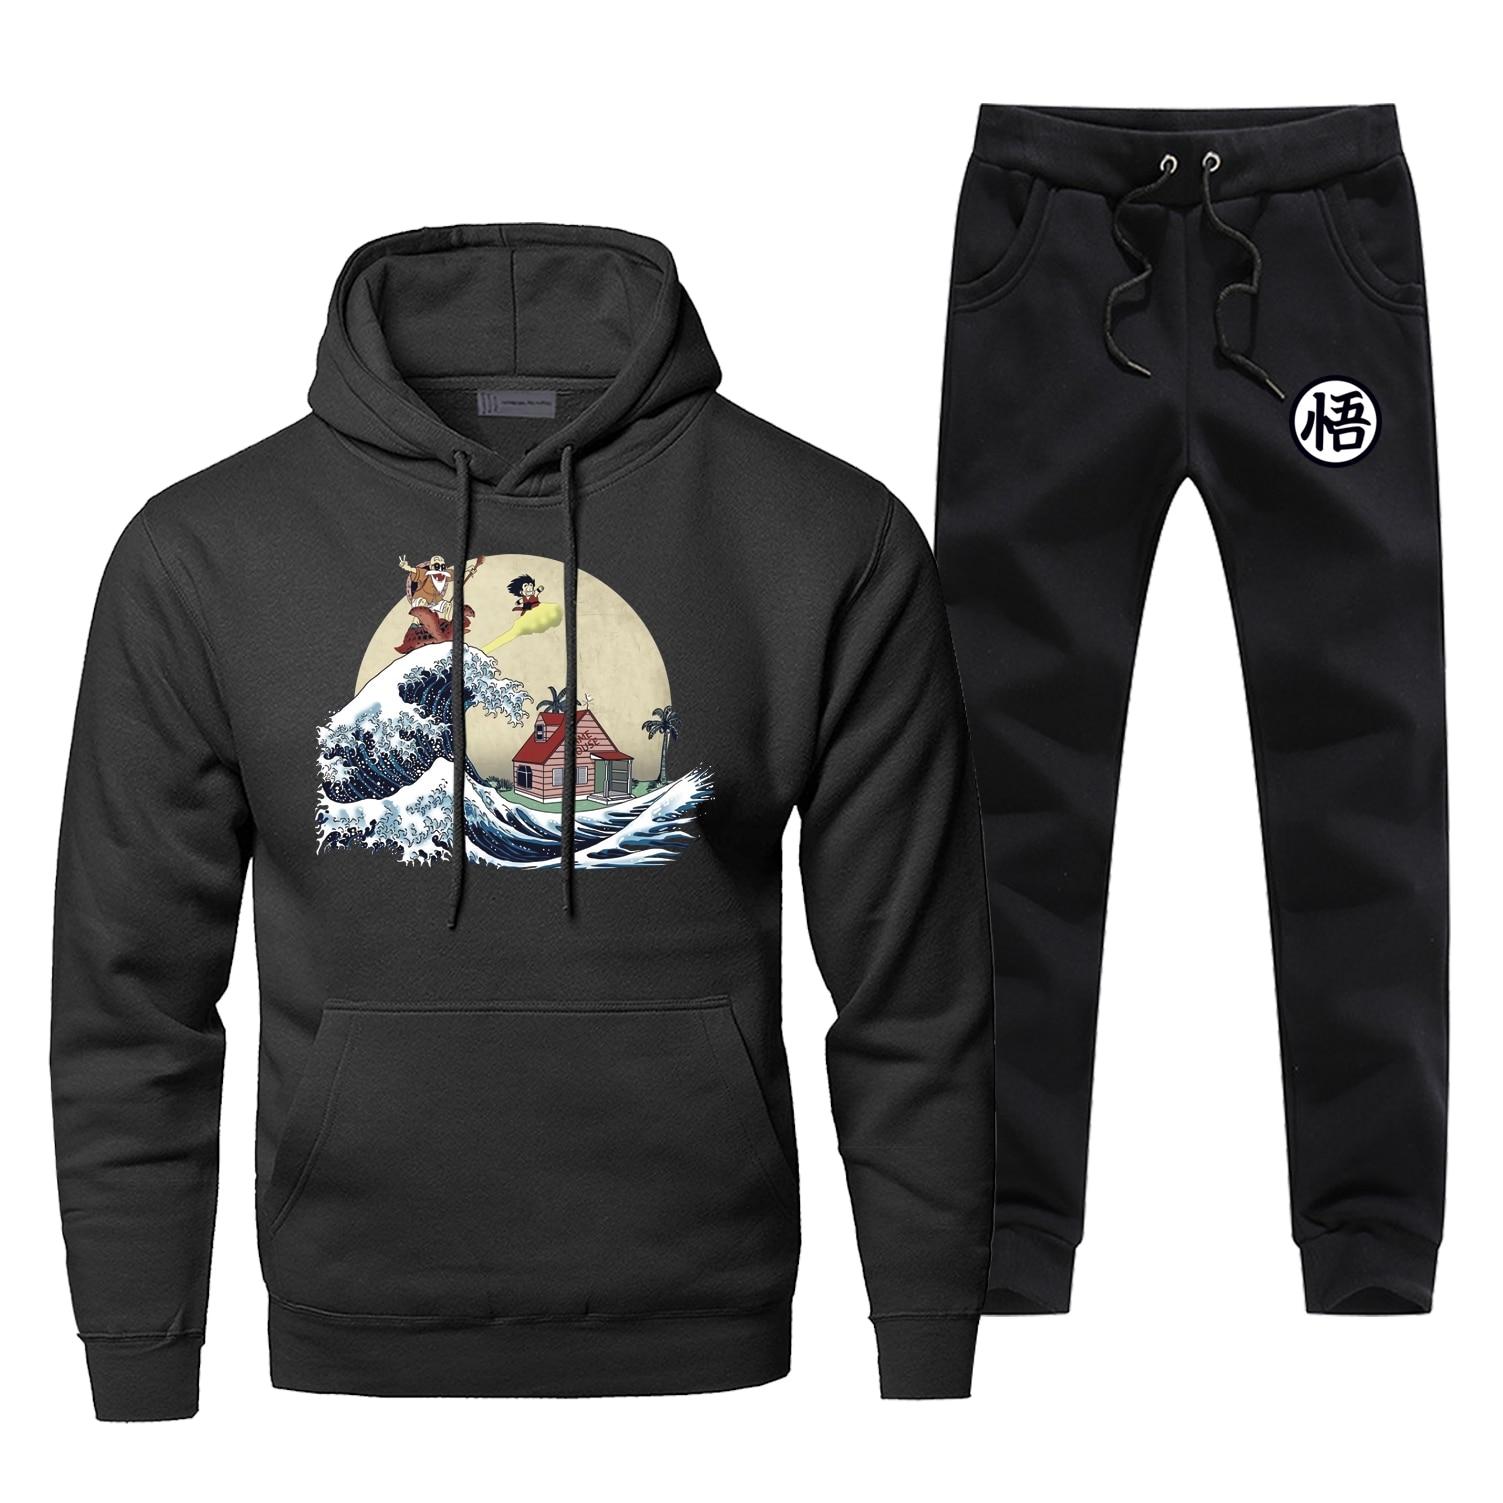 Men Hoodies Dragon Ball Sets Two Piece Pant The Great Retro Wave Hoodies Sweatshirt Sweatpants Streetwear Sportswear Sweatshirts